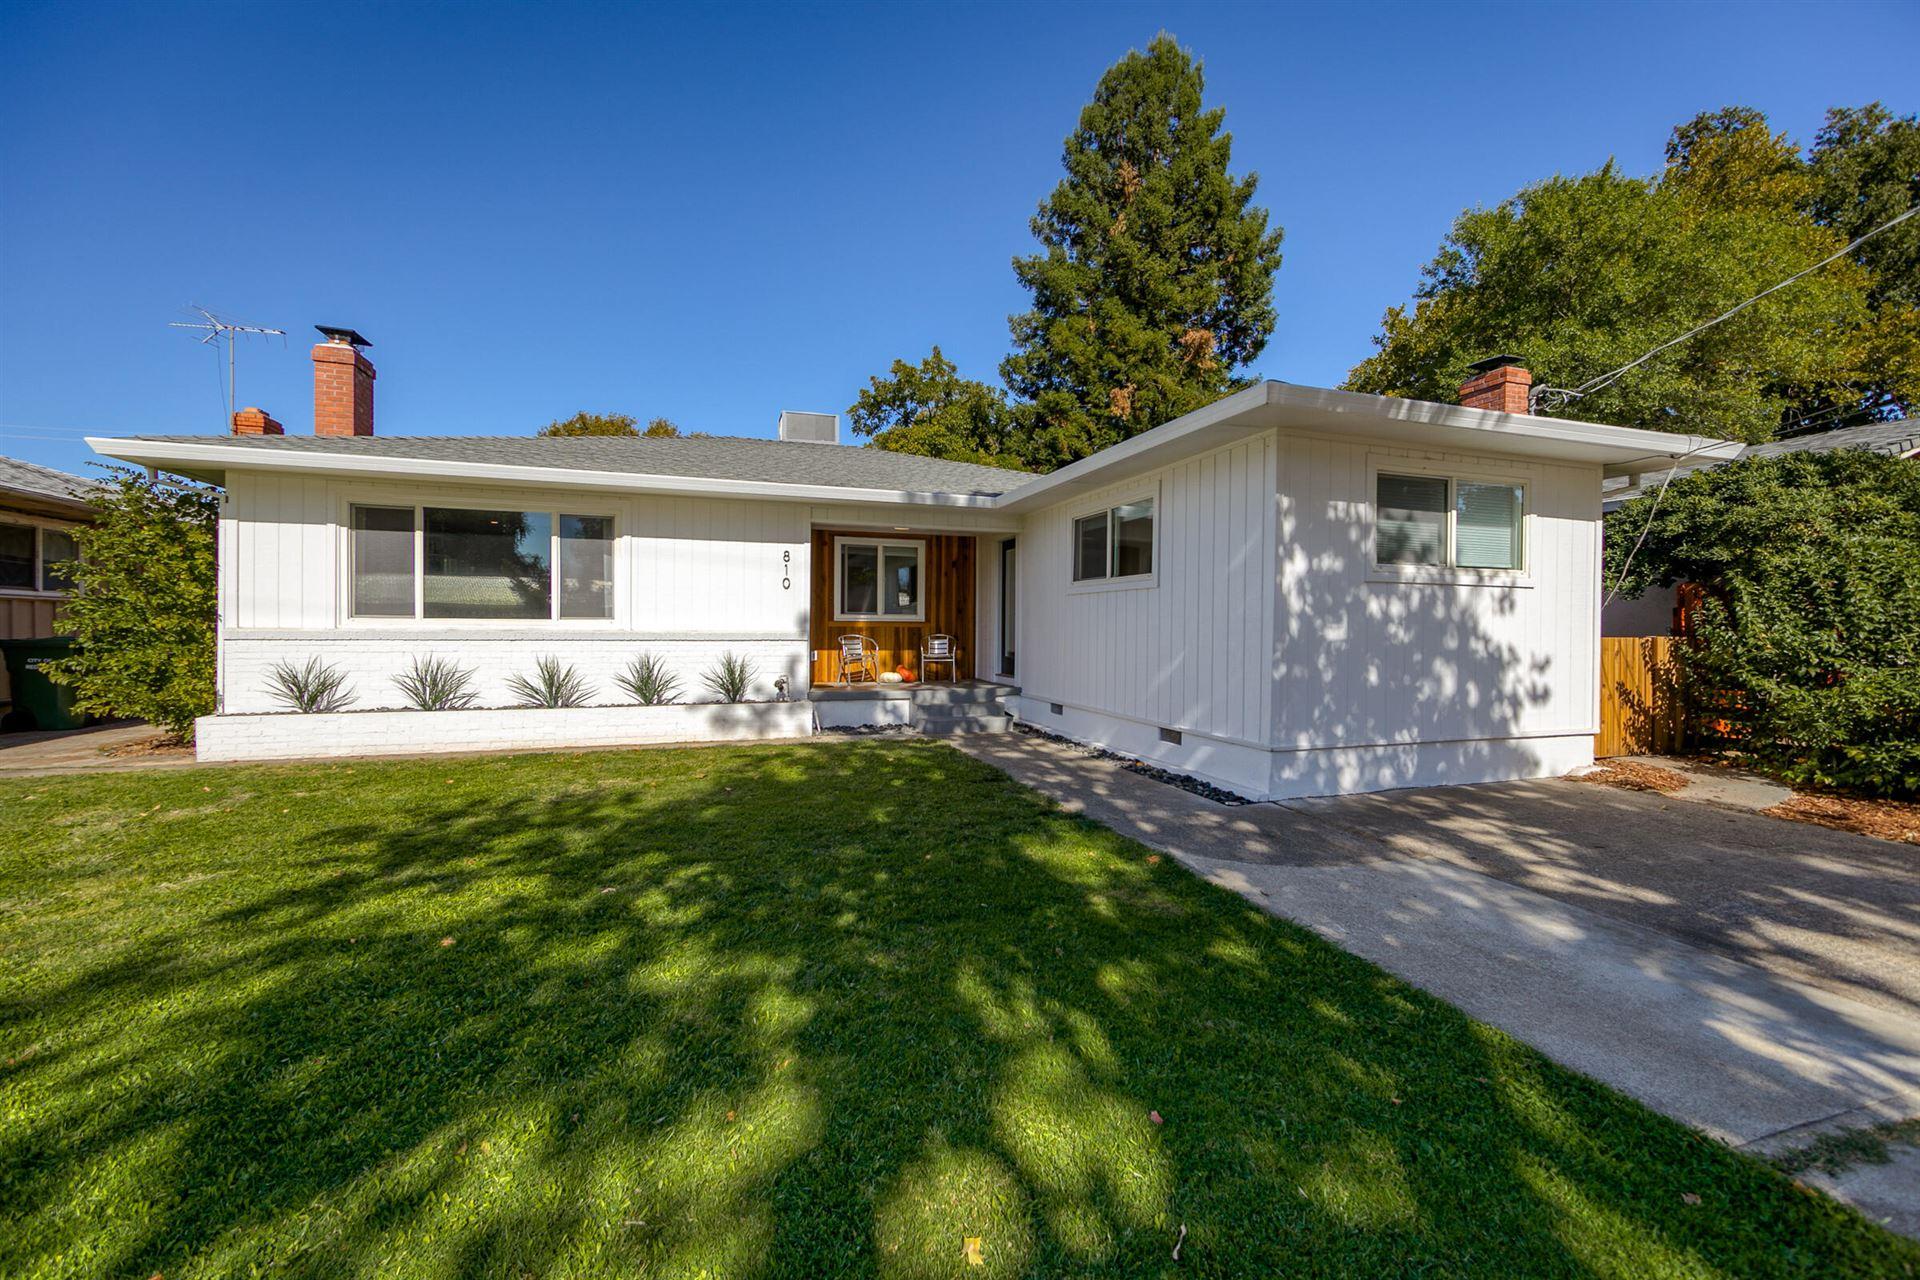 Photo of 810 Gold St, Redding, CA 96001 (MLS # 21-4912)